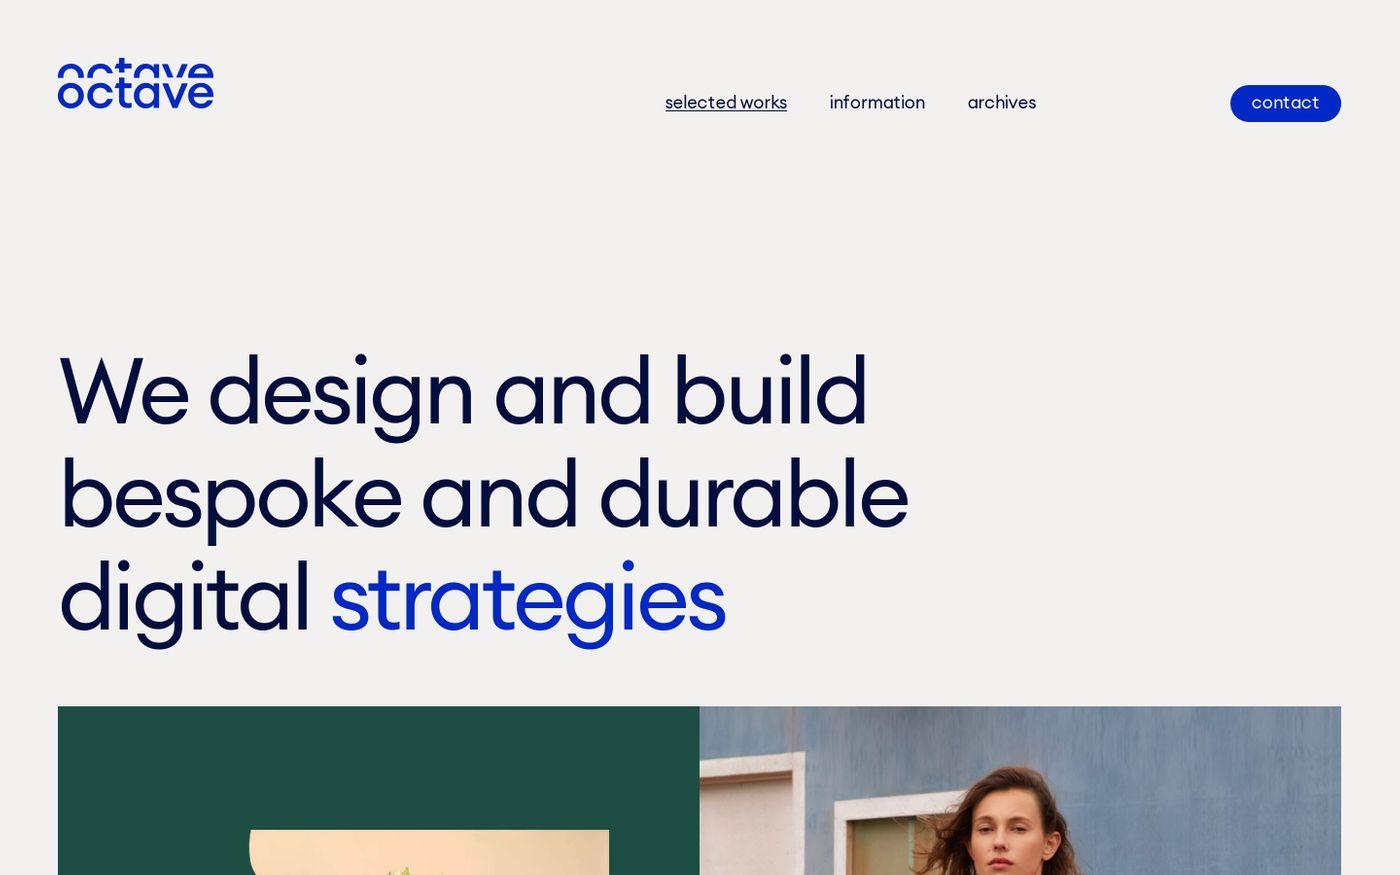 Screenshot of Octave Octave website